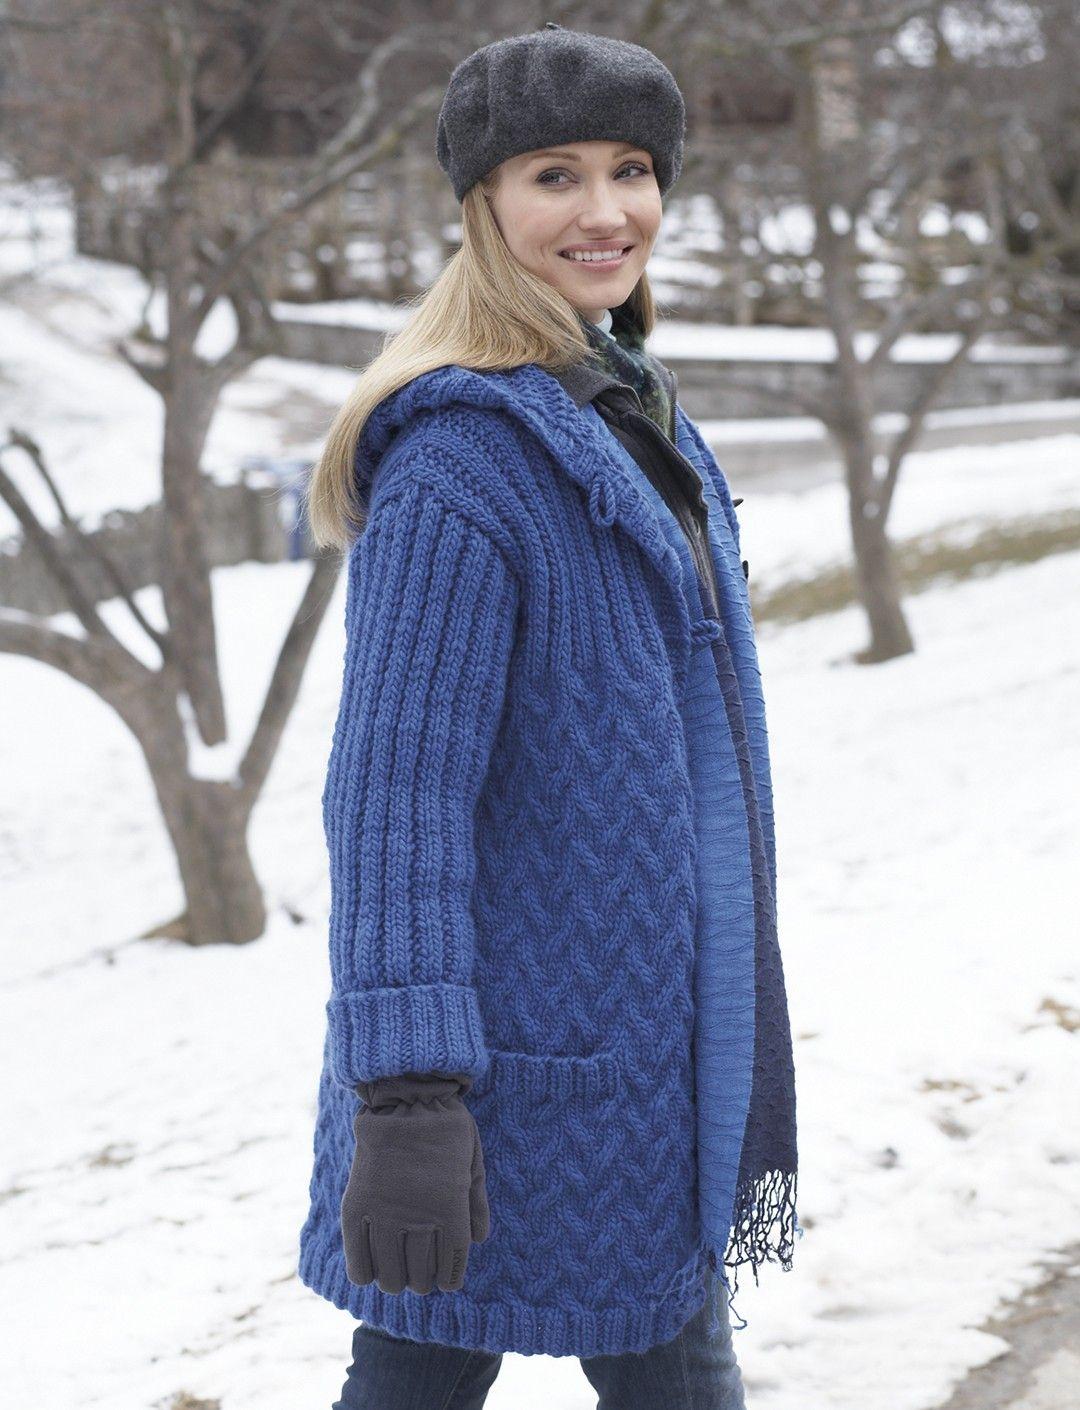 Yarnspirations.com - Patons Car Coat with Hood - Patterns ...